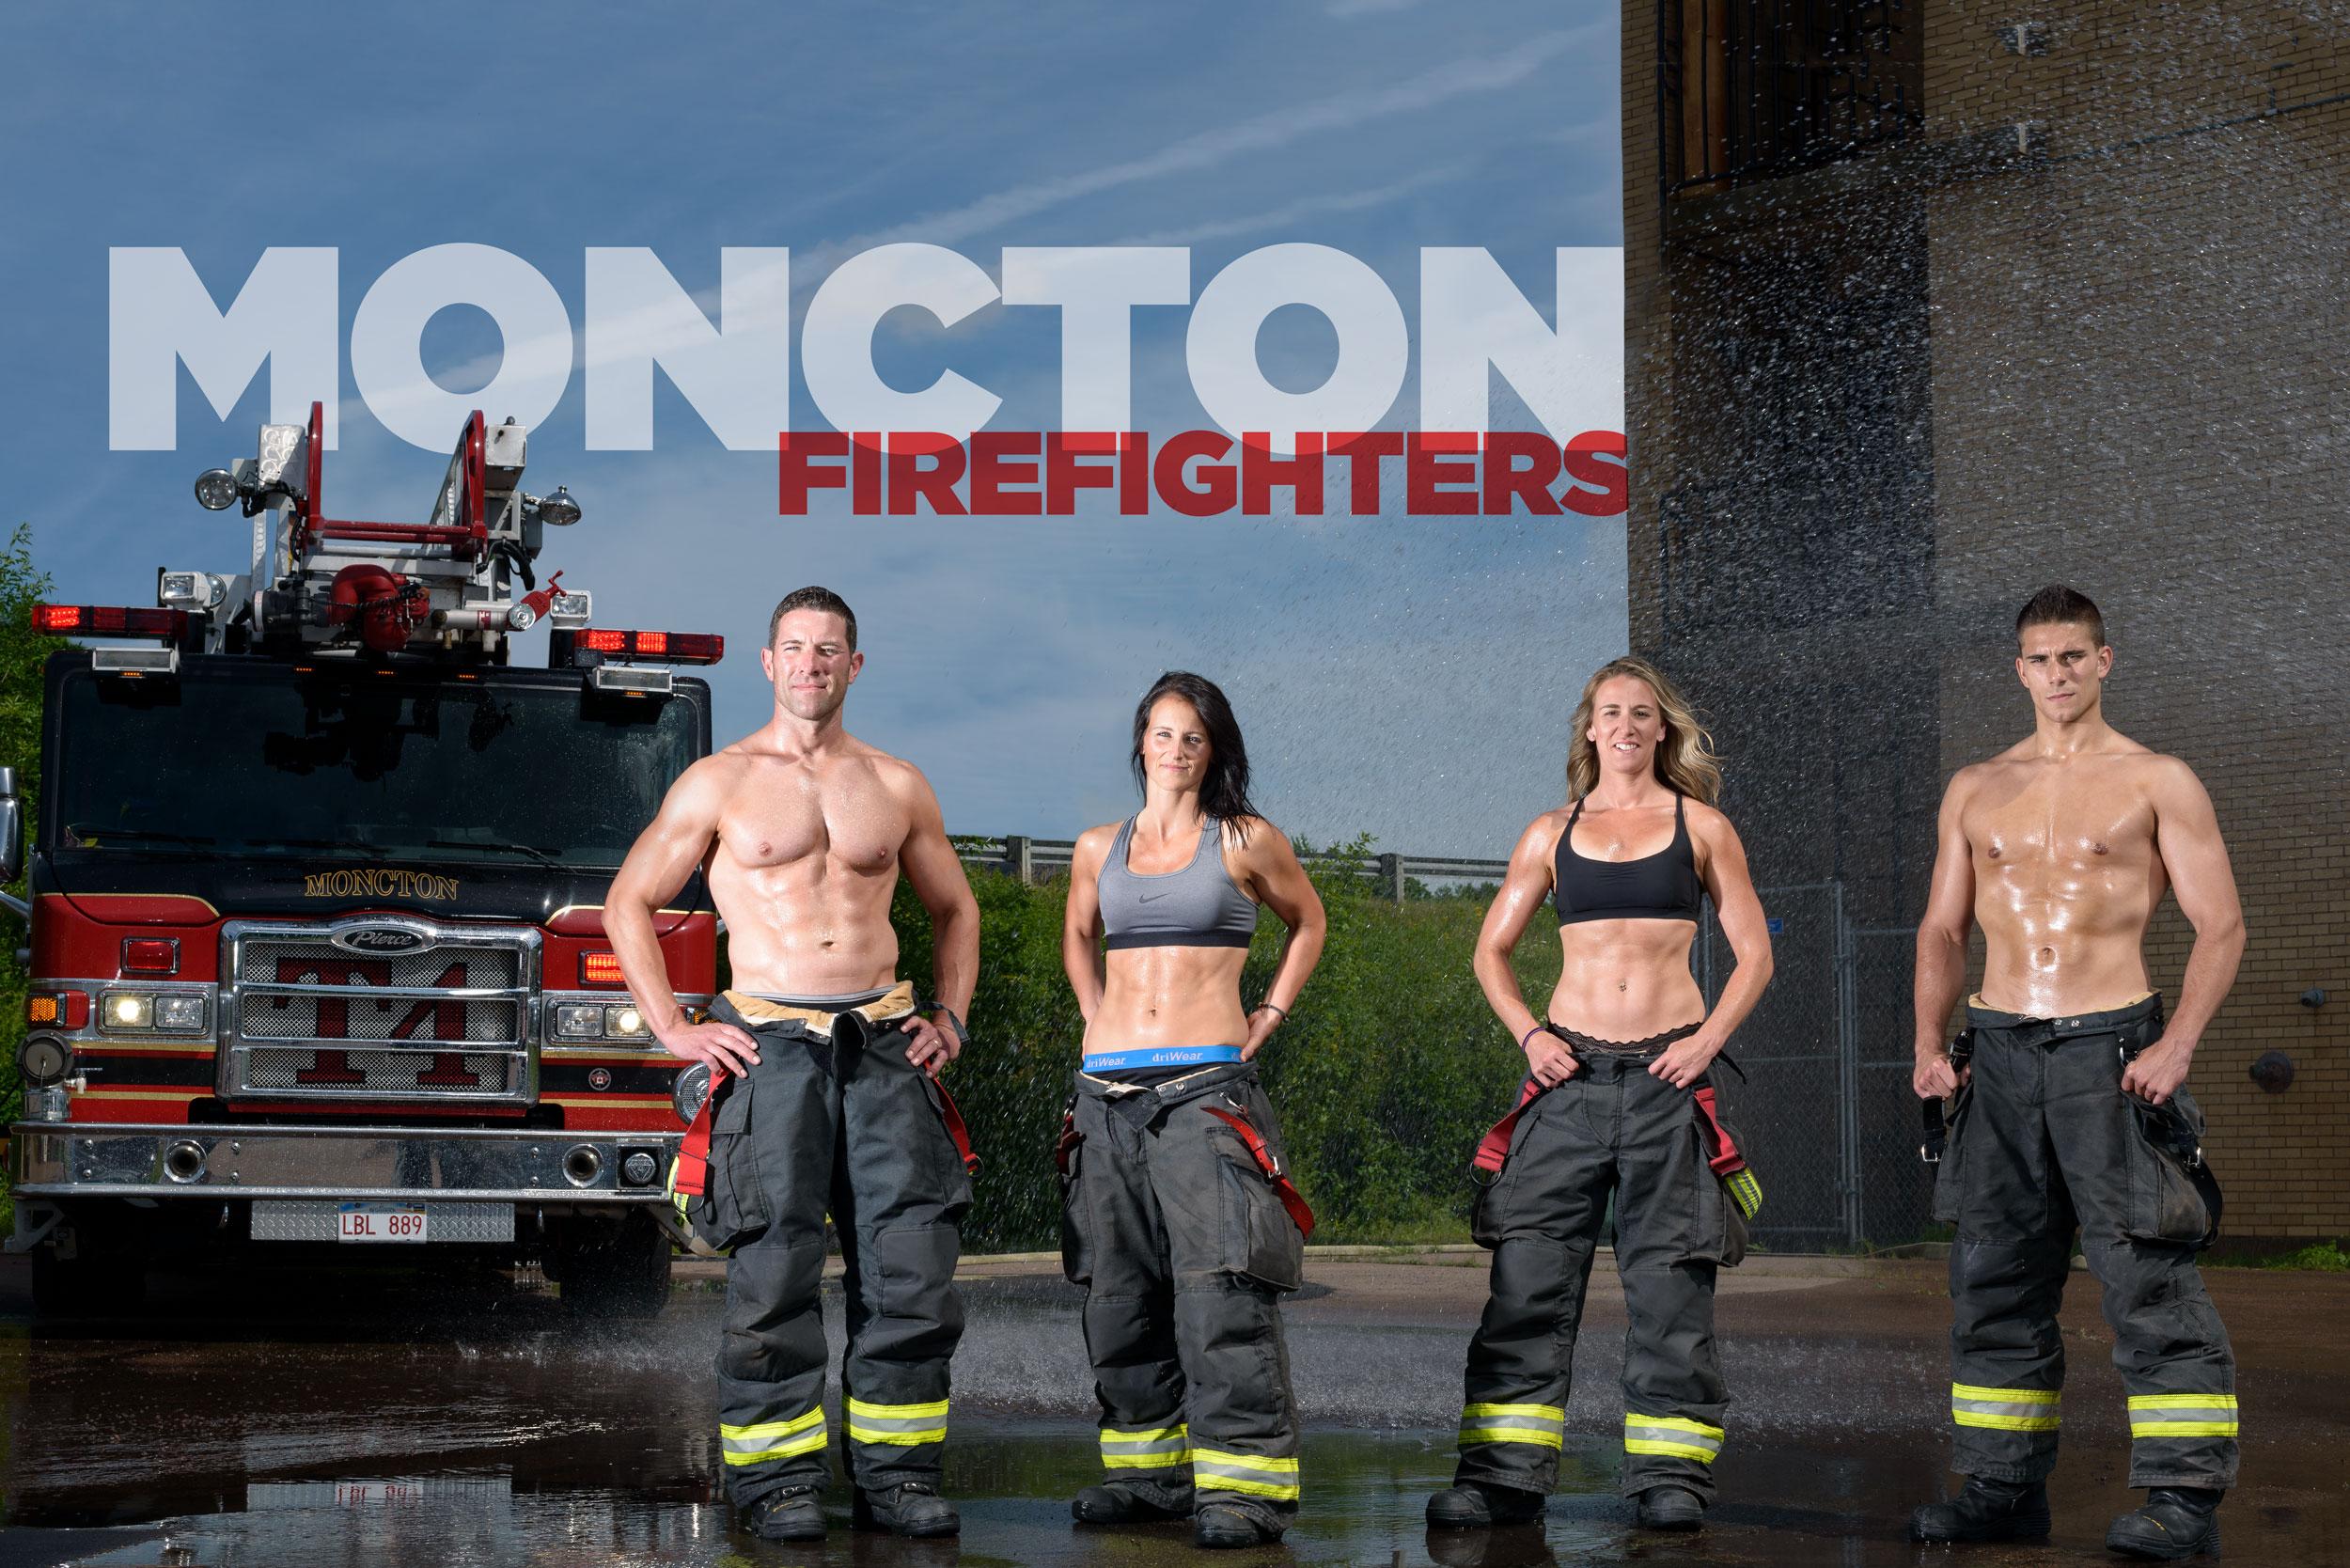 Nigel-Fearon-Photography-_-Moncton-Firefighter-Calendar-Cover.jpg